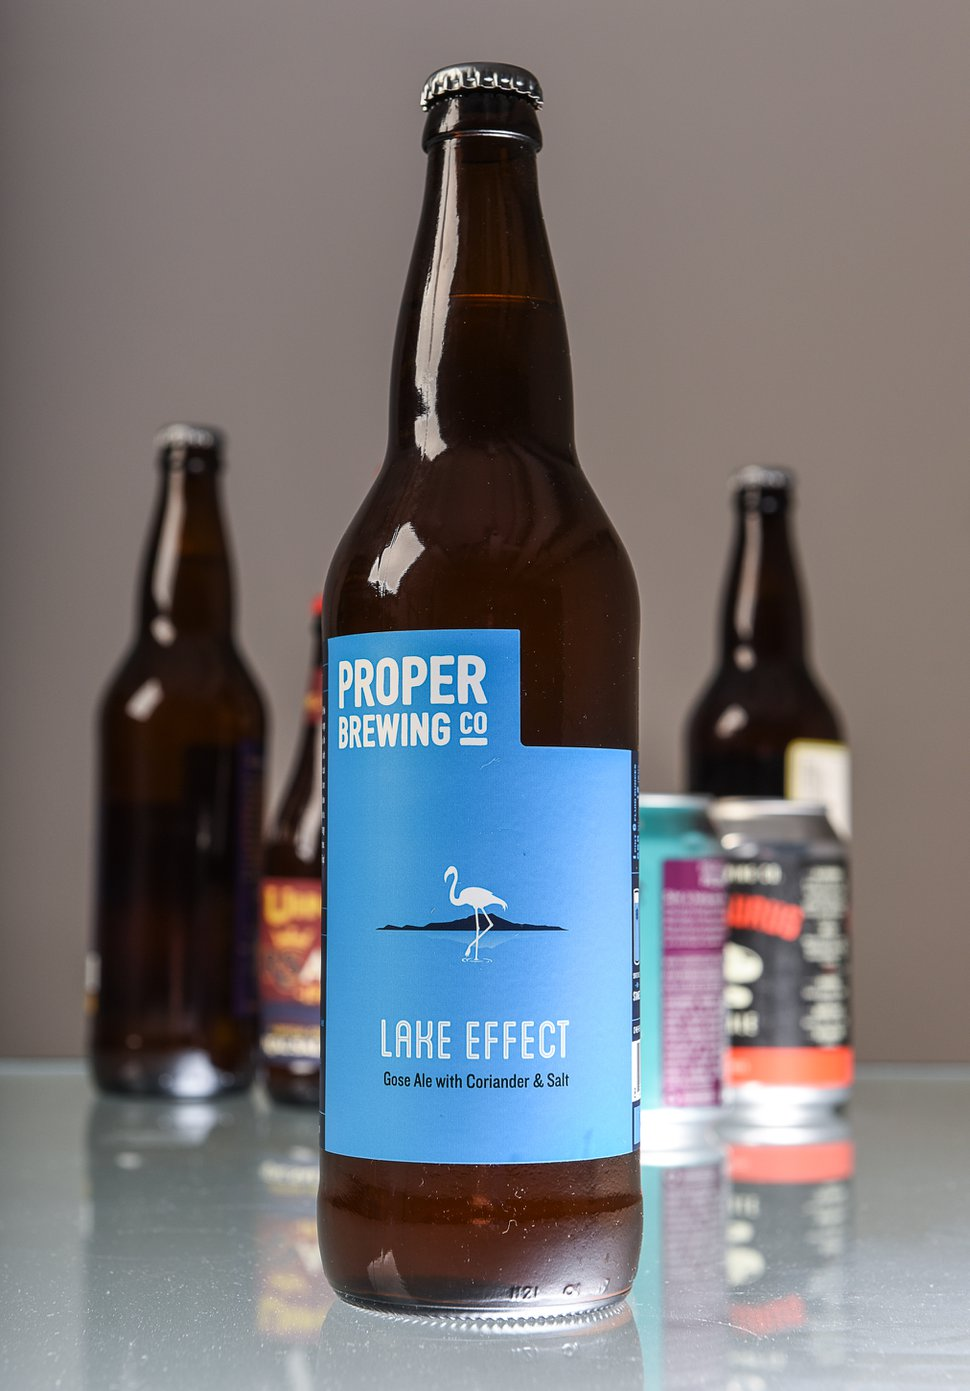 (Francisco Kjolseth | The Salt Lake Tribune) Utah's best beer names. Lake Effect gose ale by Proper Brewing Co.